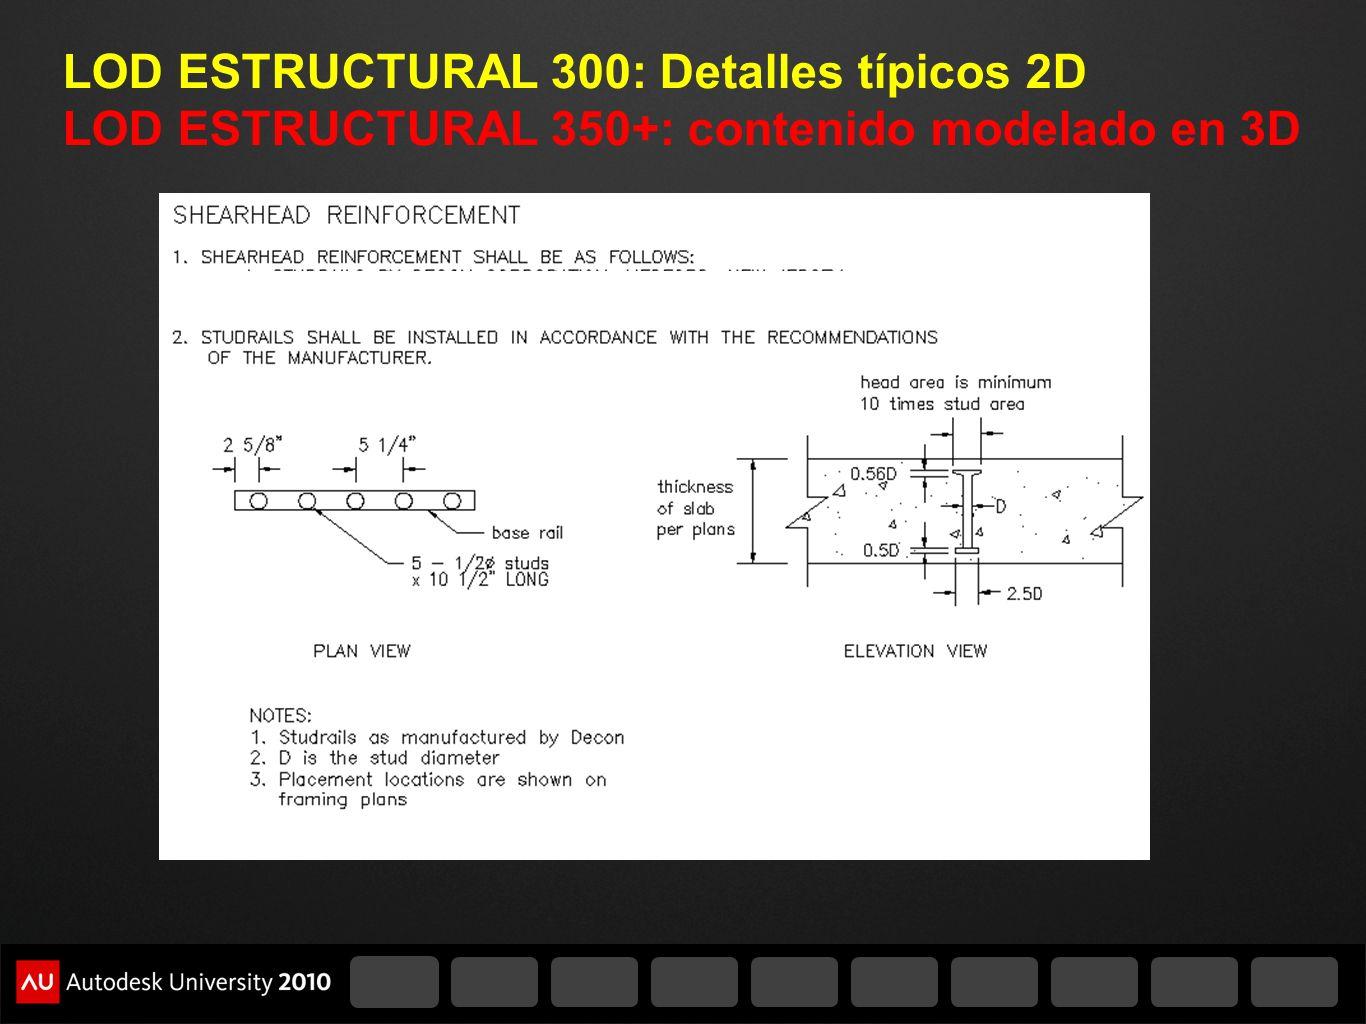 LOD ESTRUCTURAL 300: Detalles típicos 2D LOD ESTRUCTURAL 350+: contenido modelado en 3D